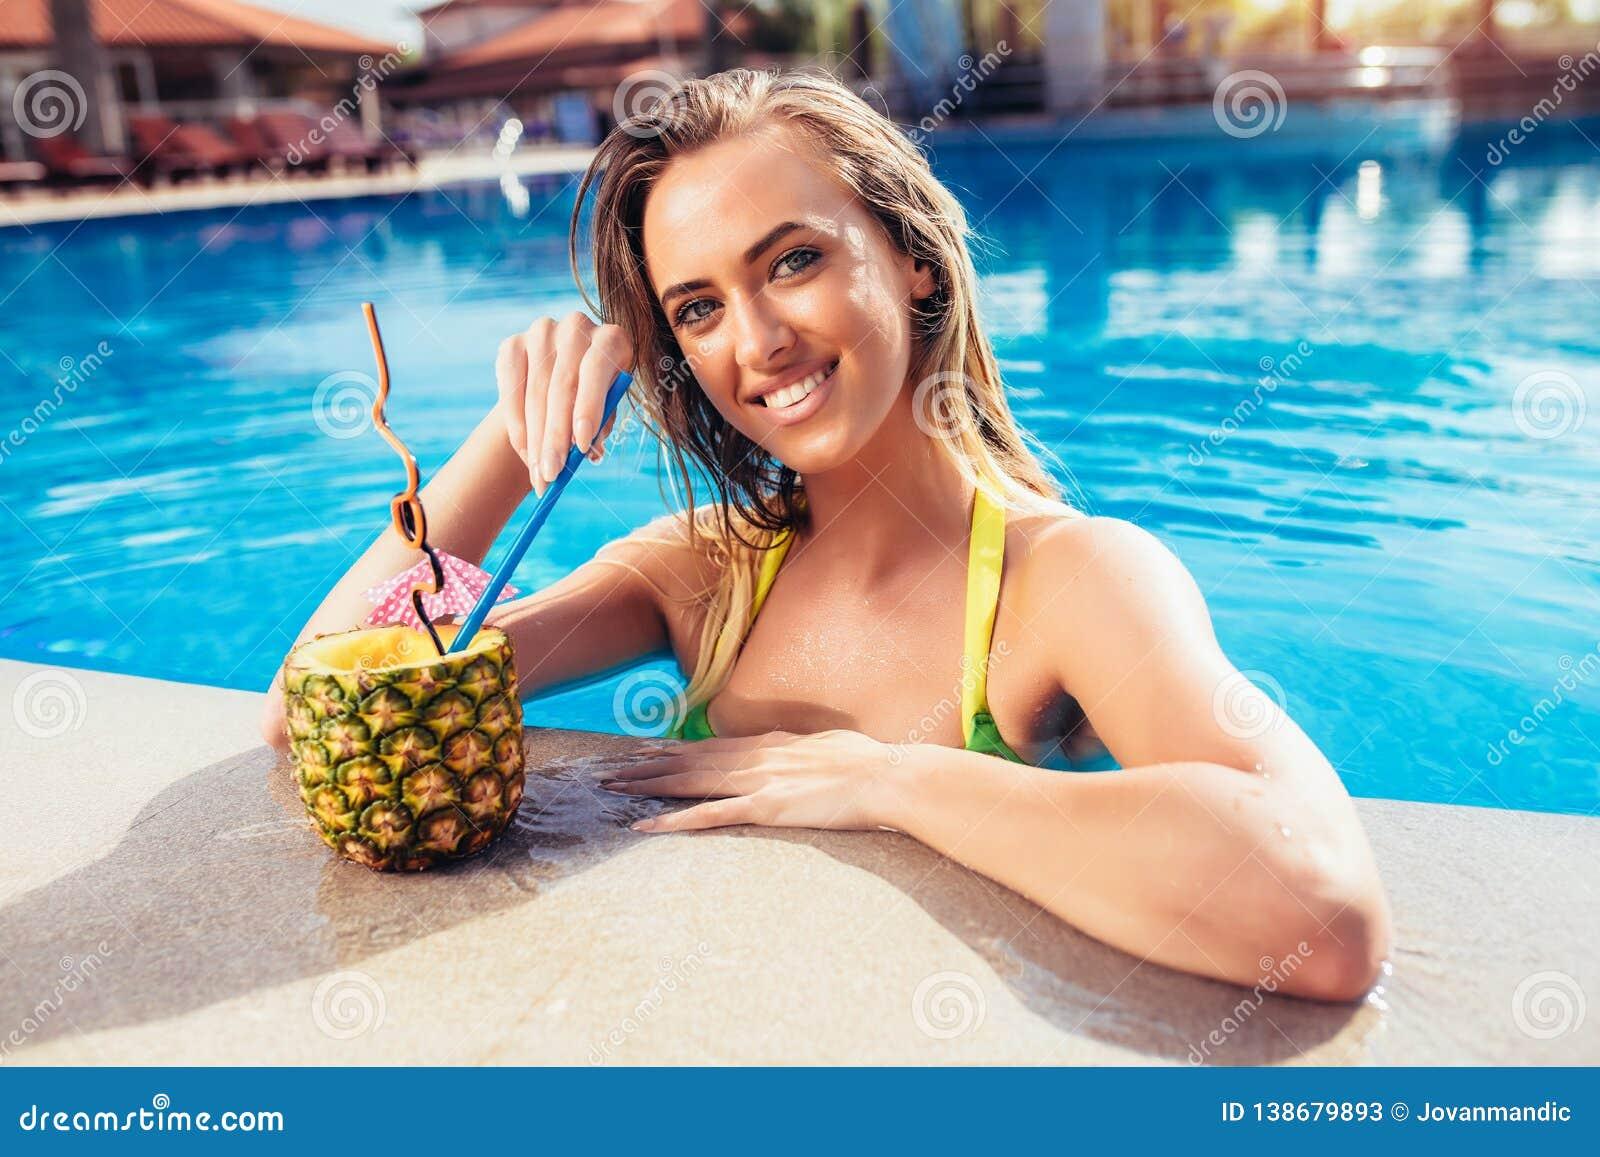 Genießen von Sonnenbräune Frau im Bikini im Swimmingpool